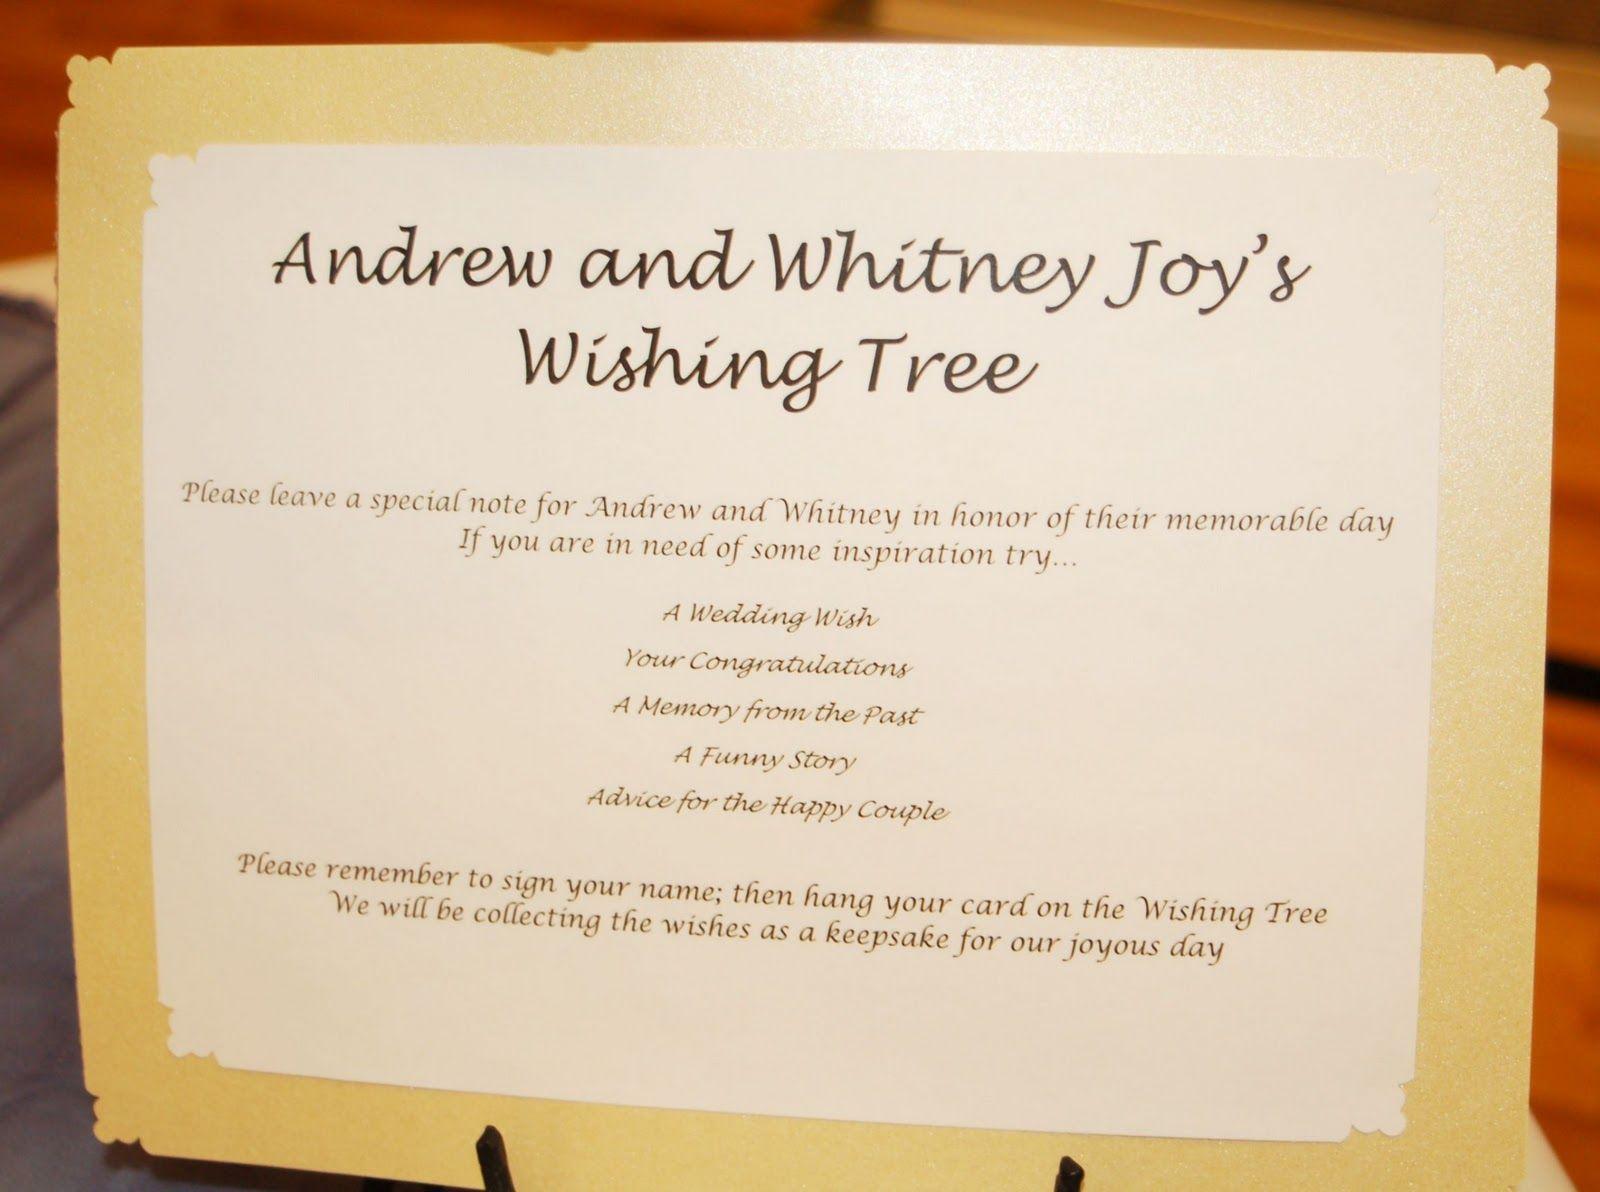 wish tree wedding tags templates Here